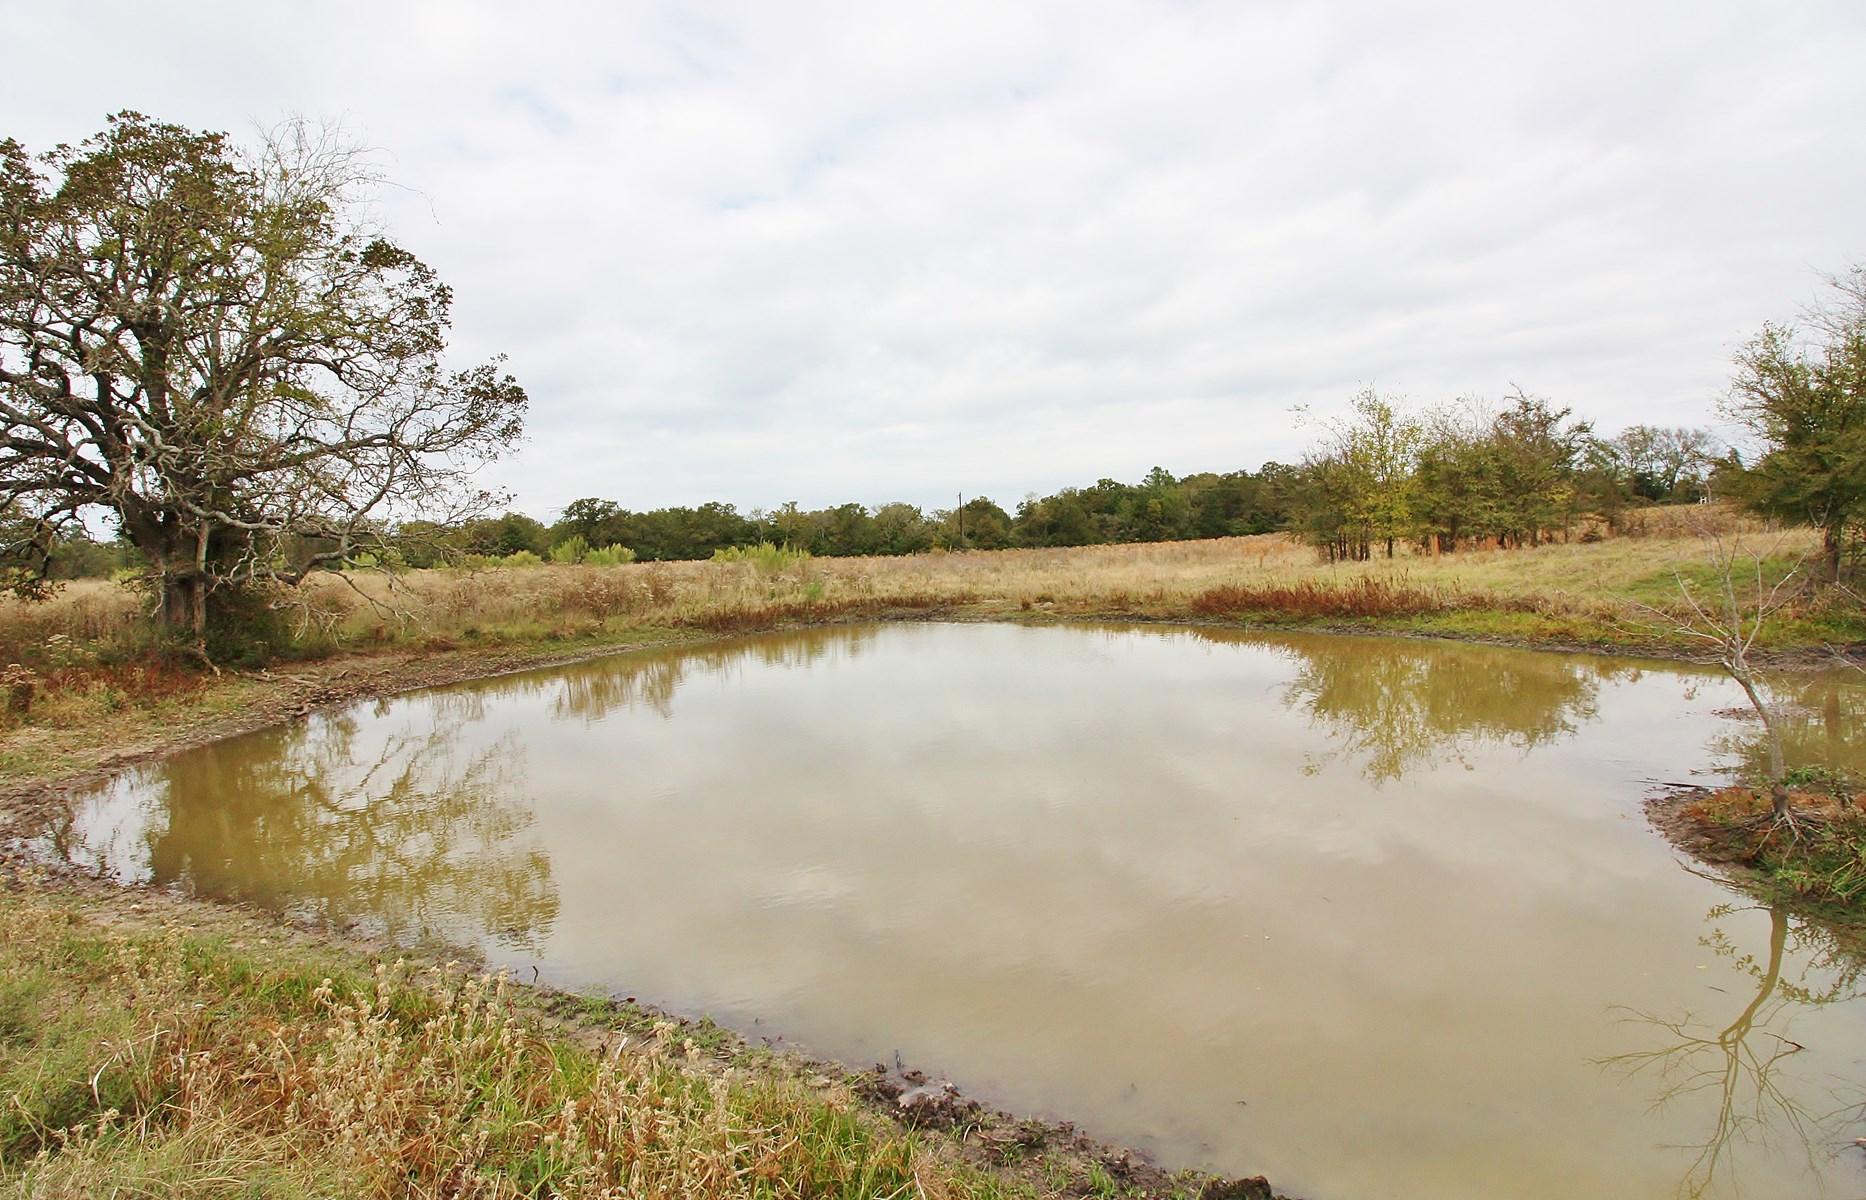 Acreage For Sale - Lake Limestone - Leon County, Texas